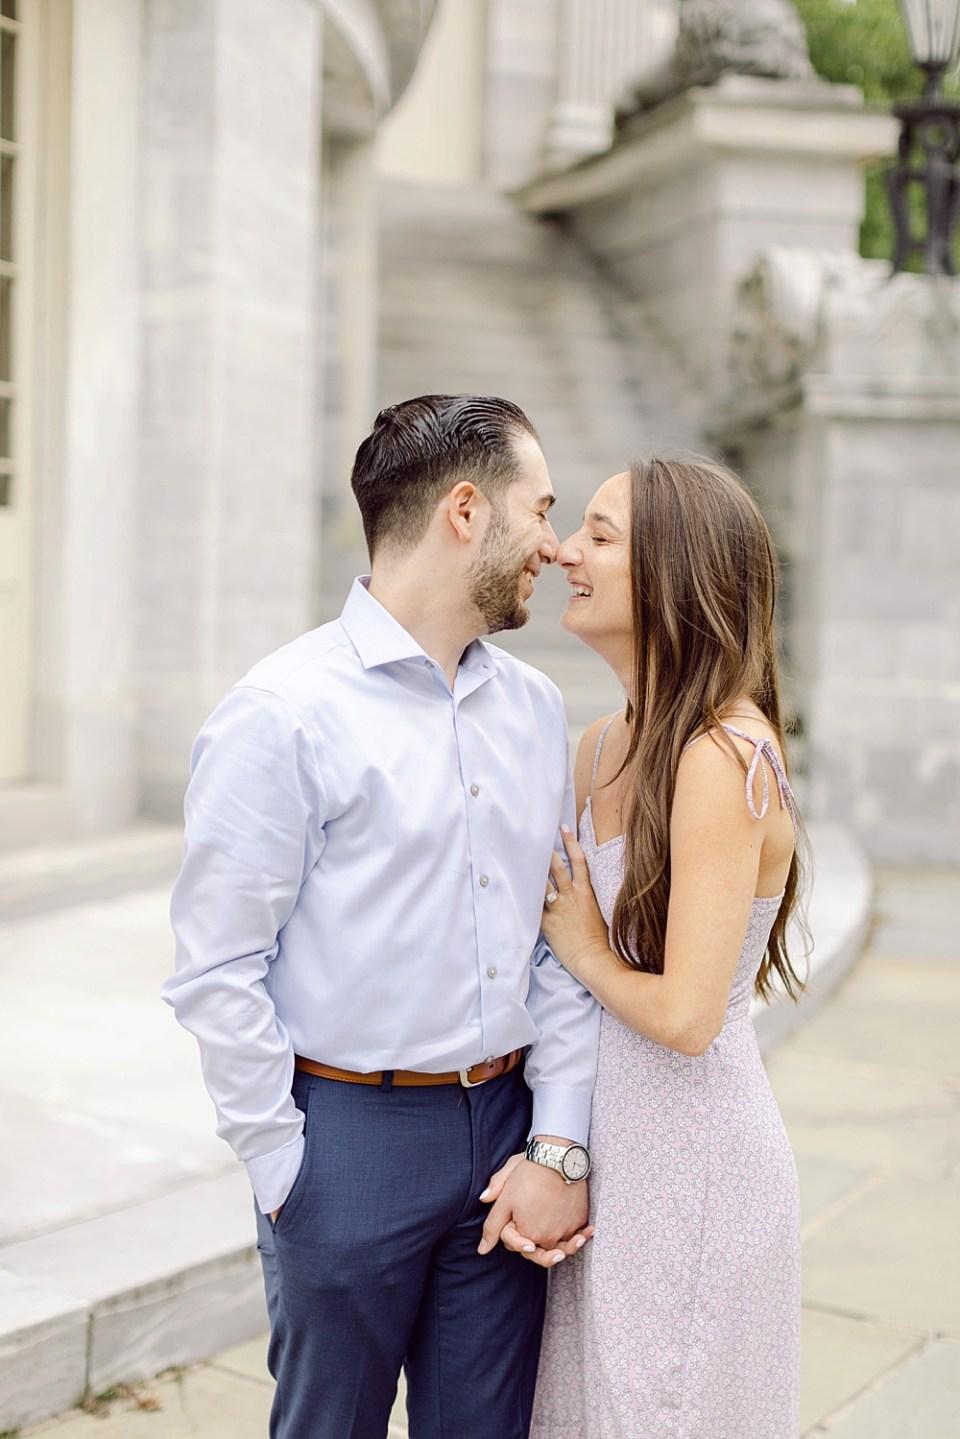 Engagement Photos in Old City Philadelphia at Merchant's Exchange Building